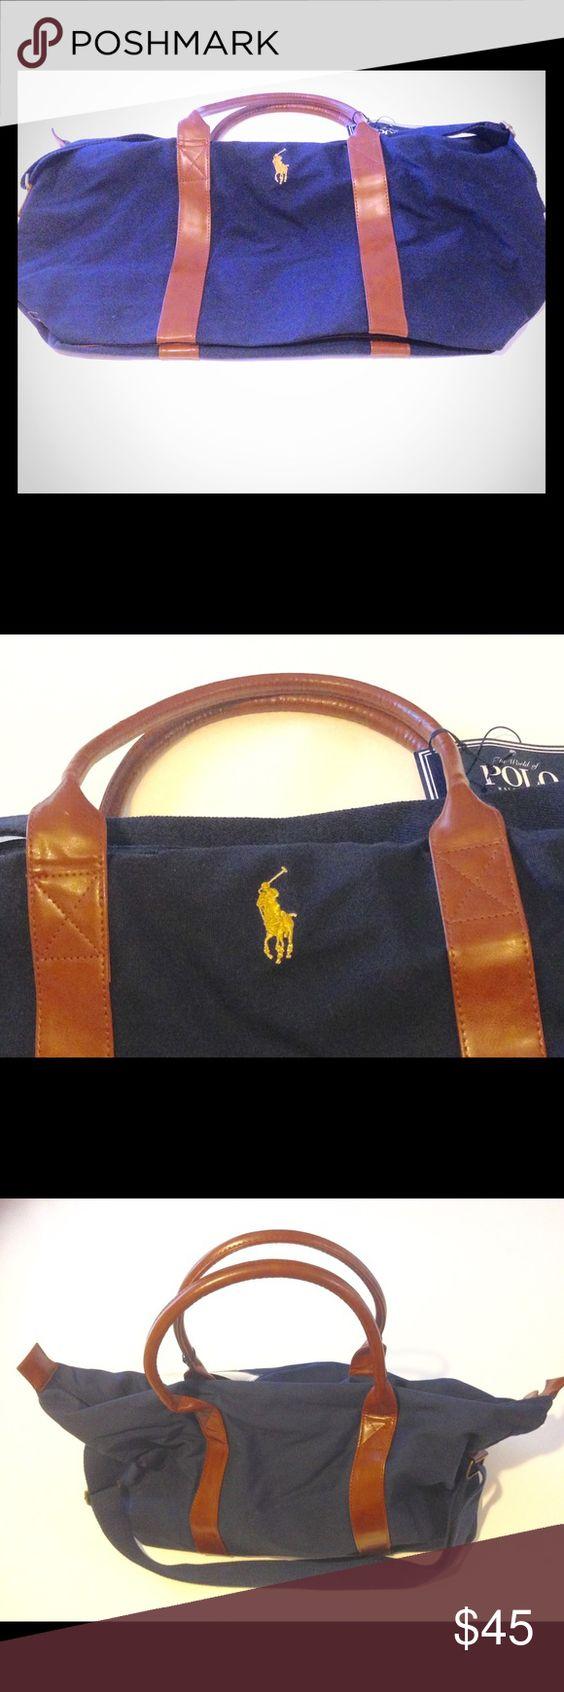 Ralph Lauren polo sport bag Brand new blue marine Polo by Ralph Lauren Bags Travel Bags